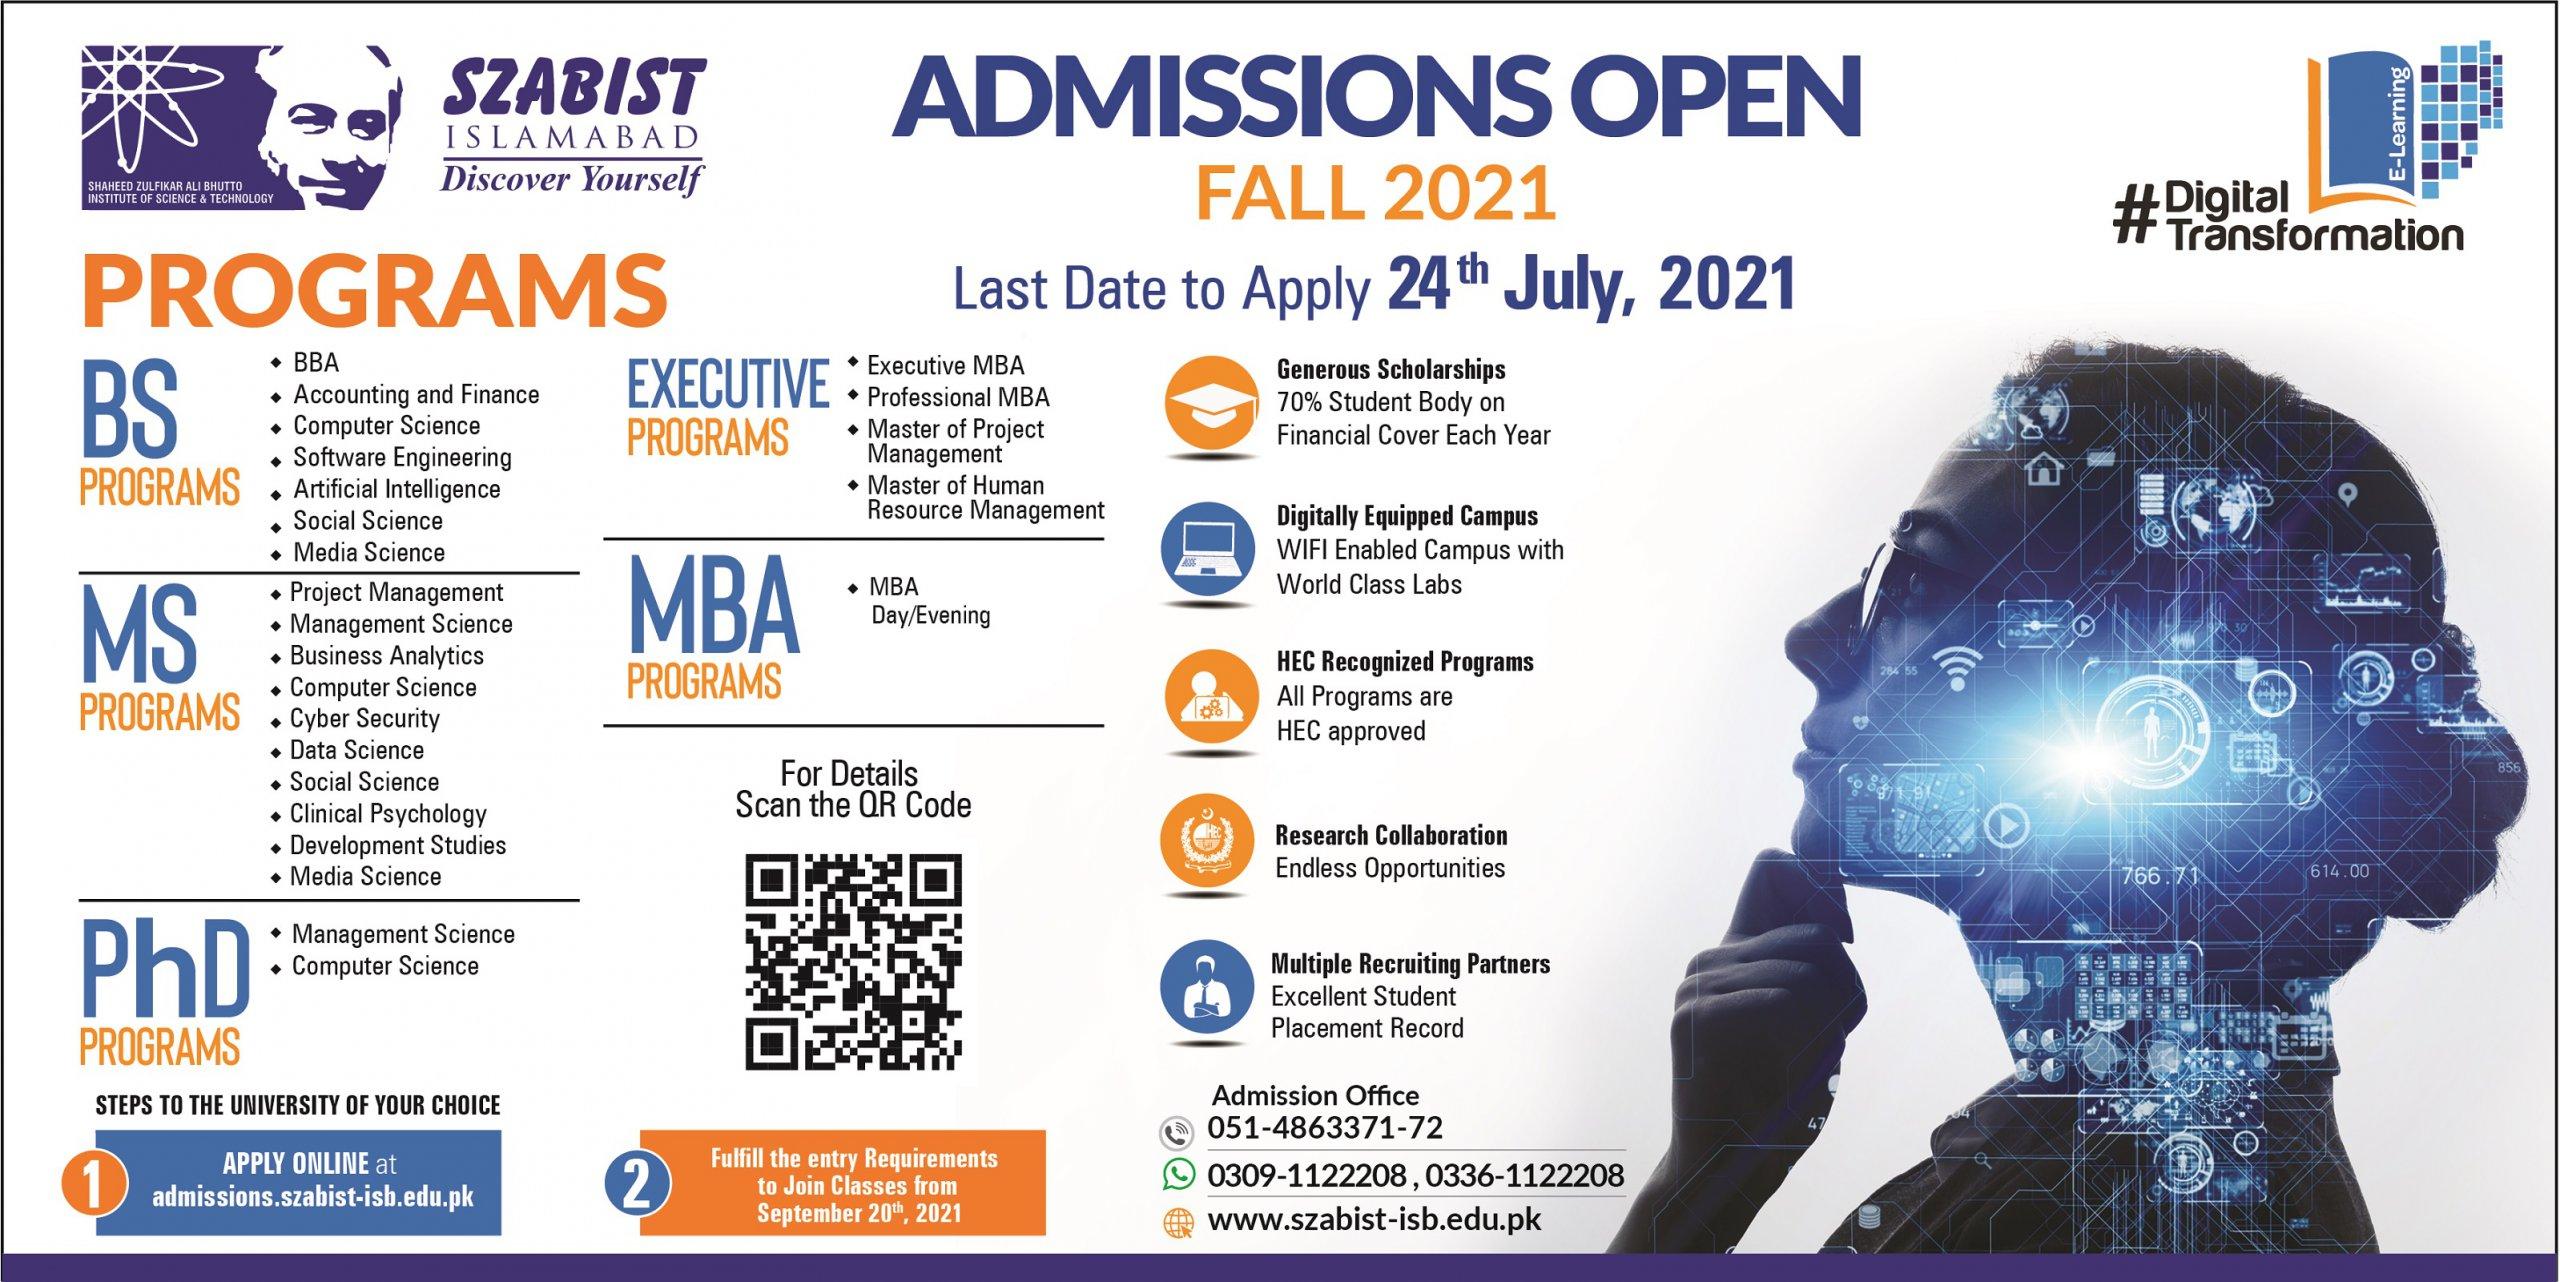 SZABIST admissions advertisement